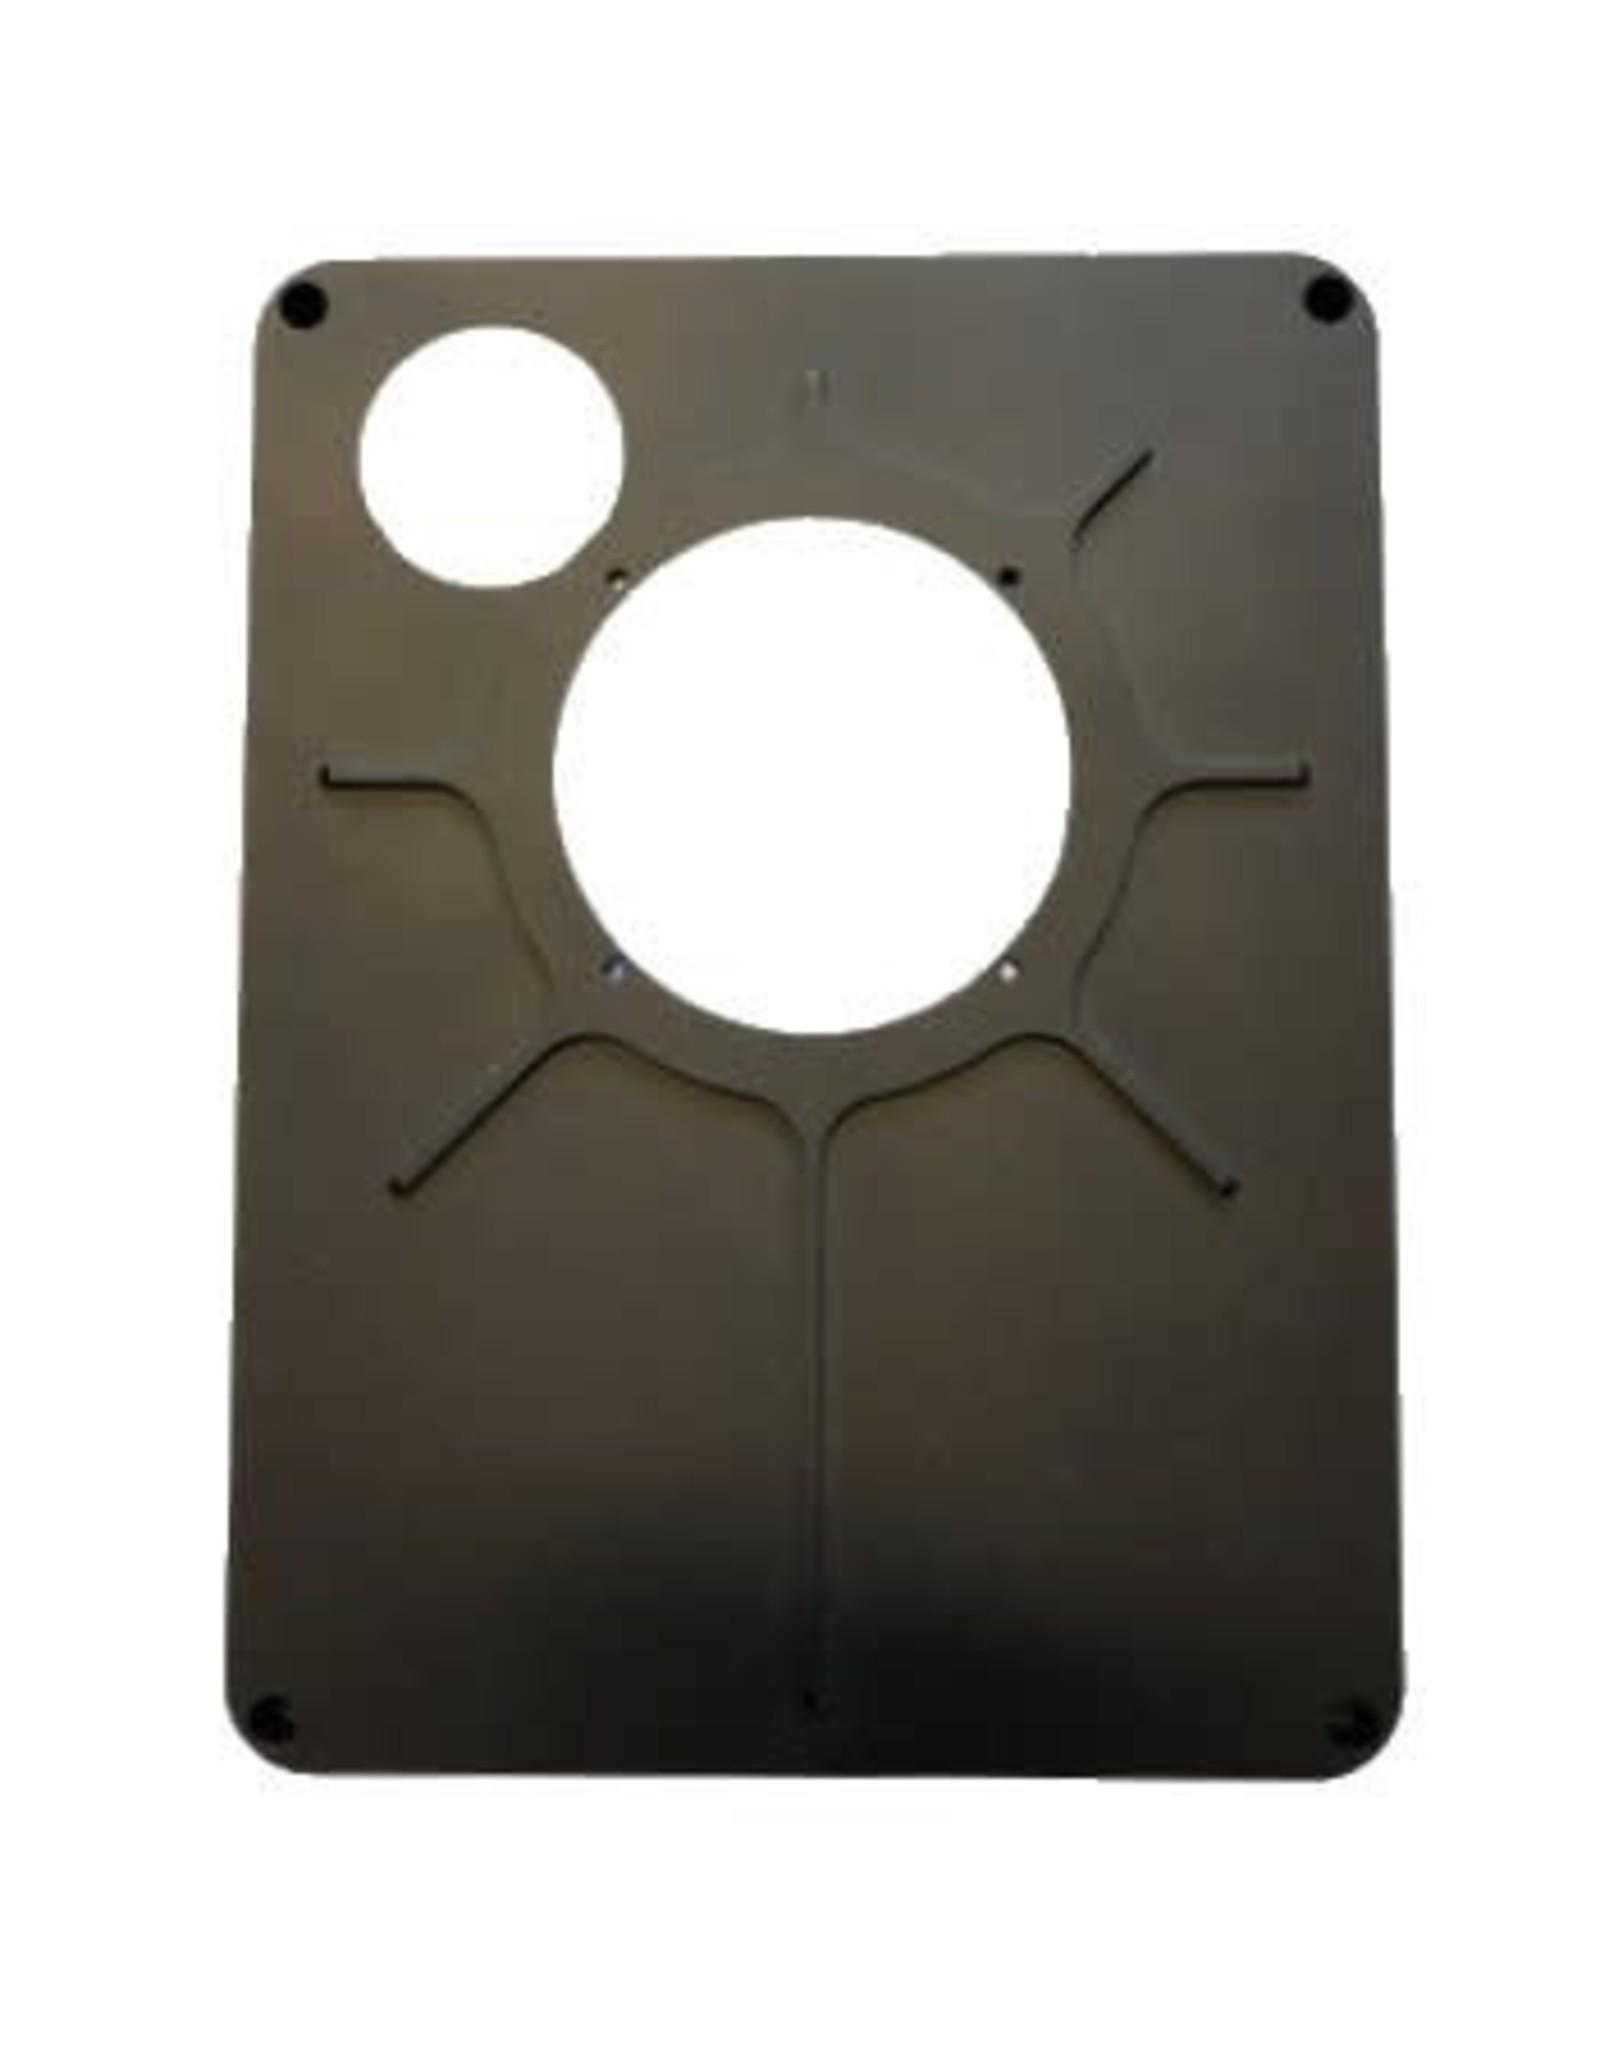 SBIG SBIG FW8-ALUMA-STD-COVER Standard Cover for the Aluma Filter Wheel